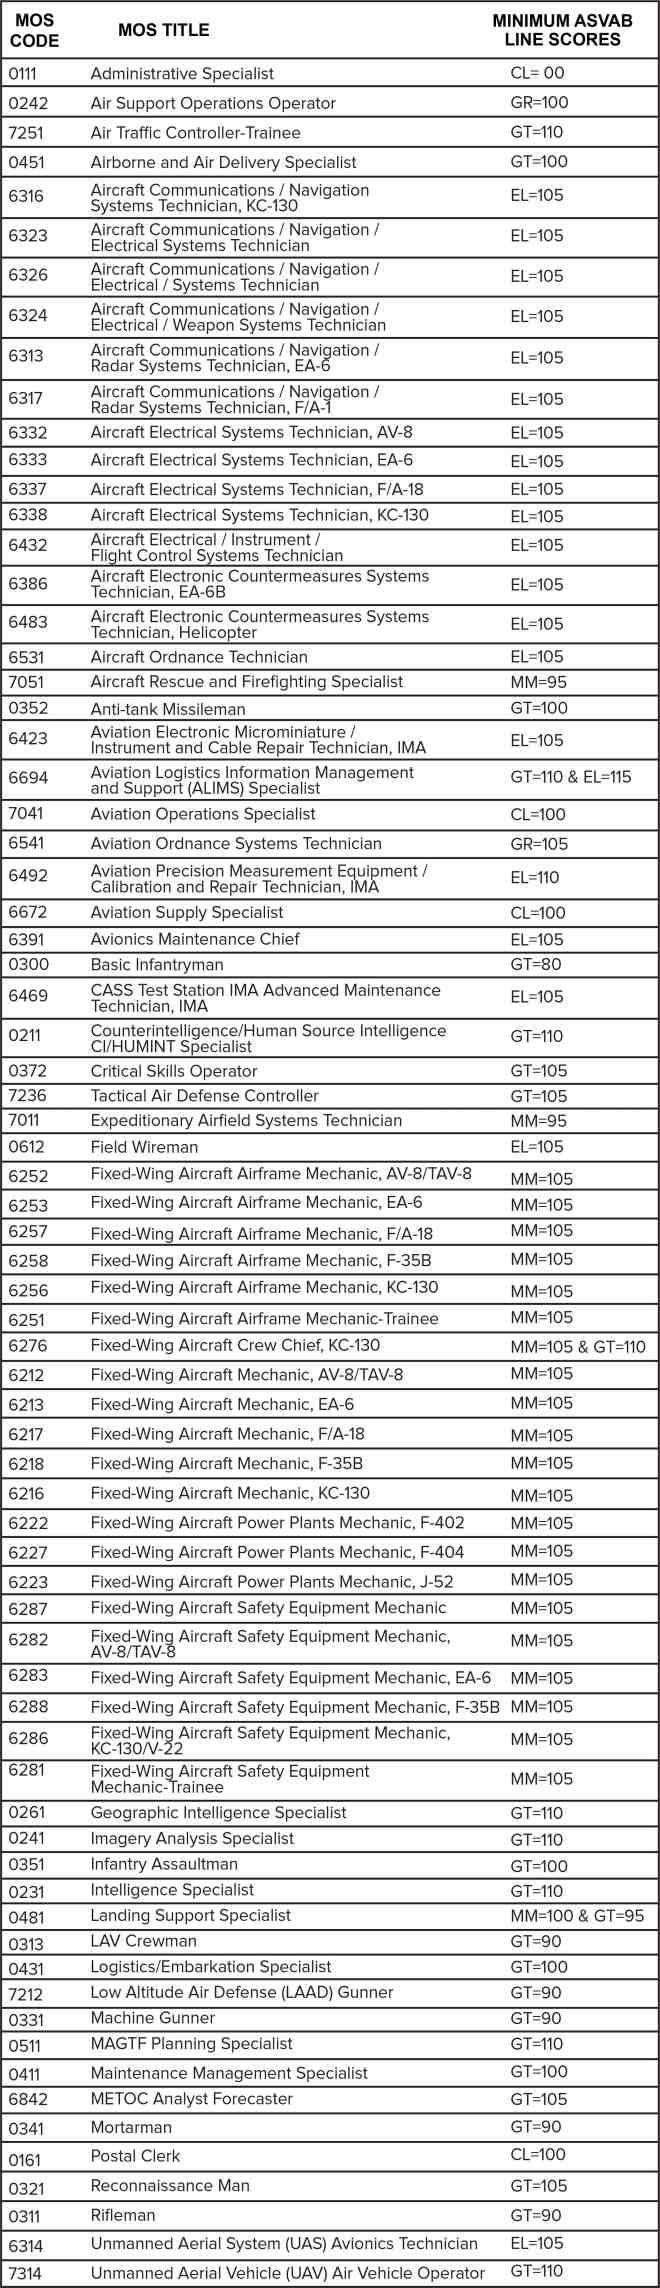 ASVAB Marine Qualification Min Scores